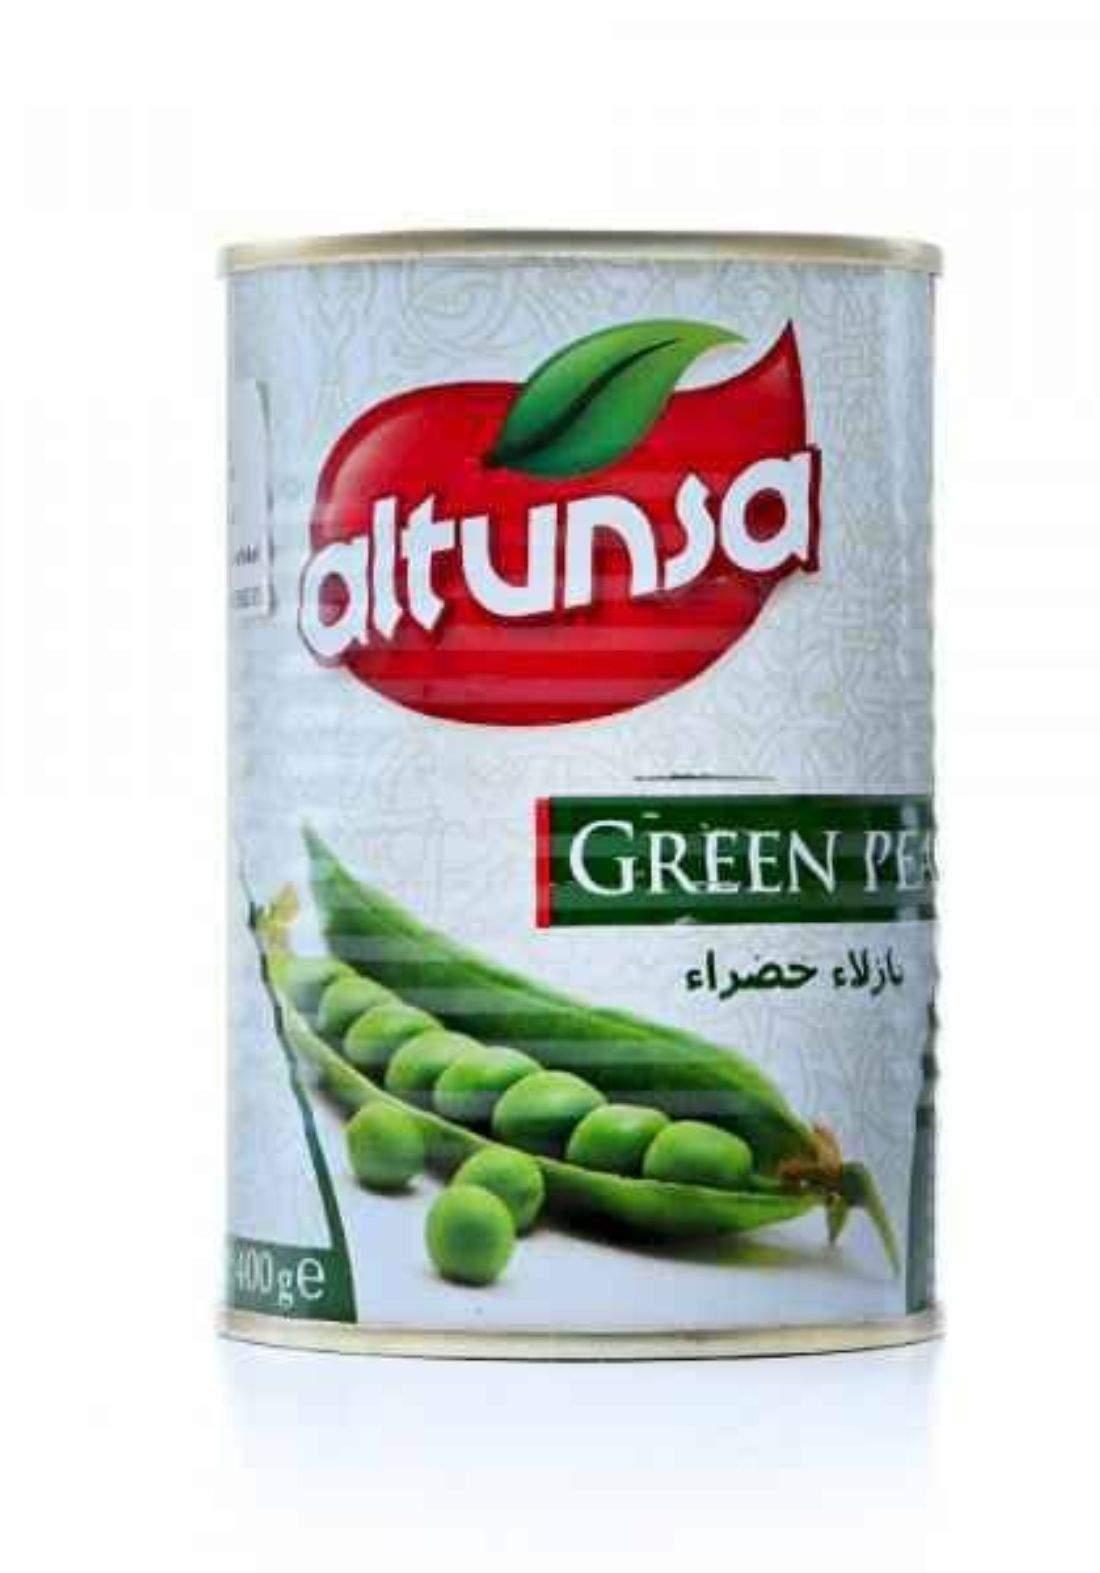 Altunsa green peas 400g لبتون سا بازلاء خضراء